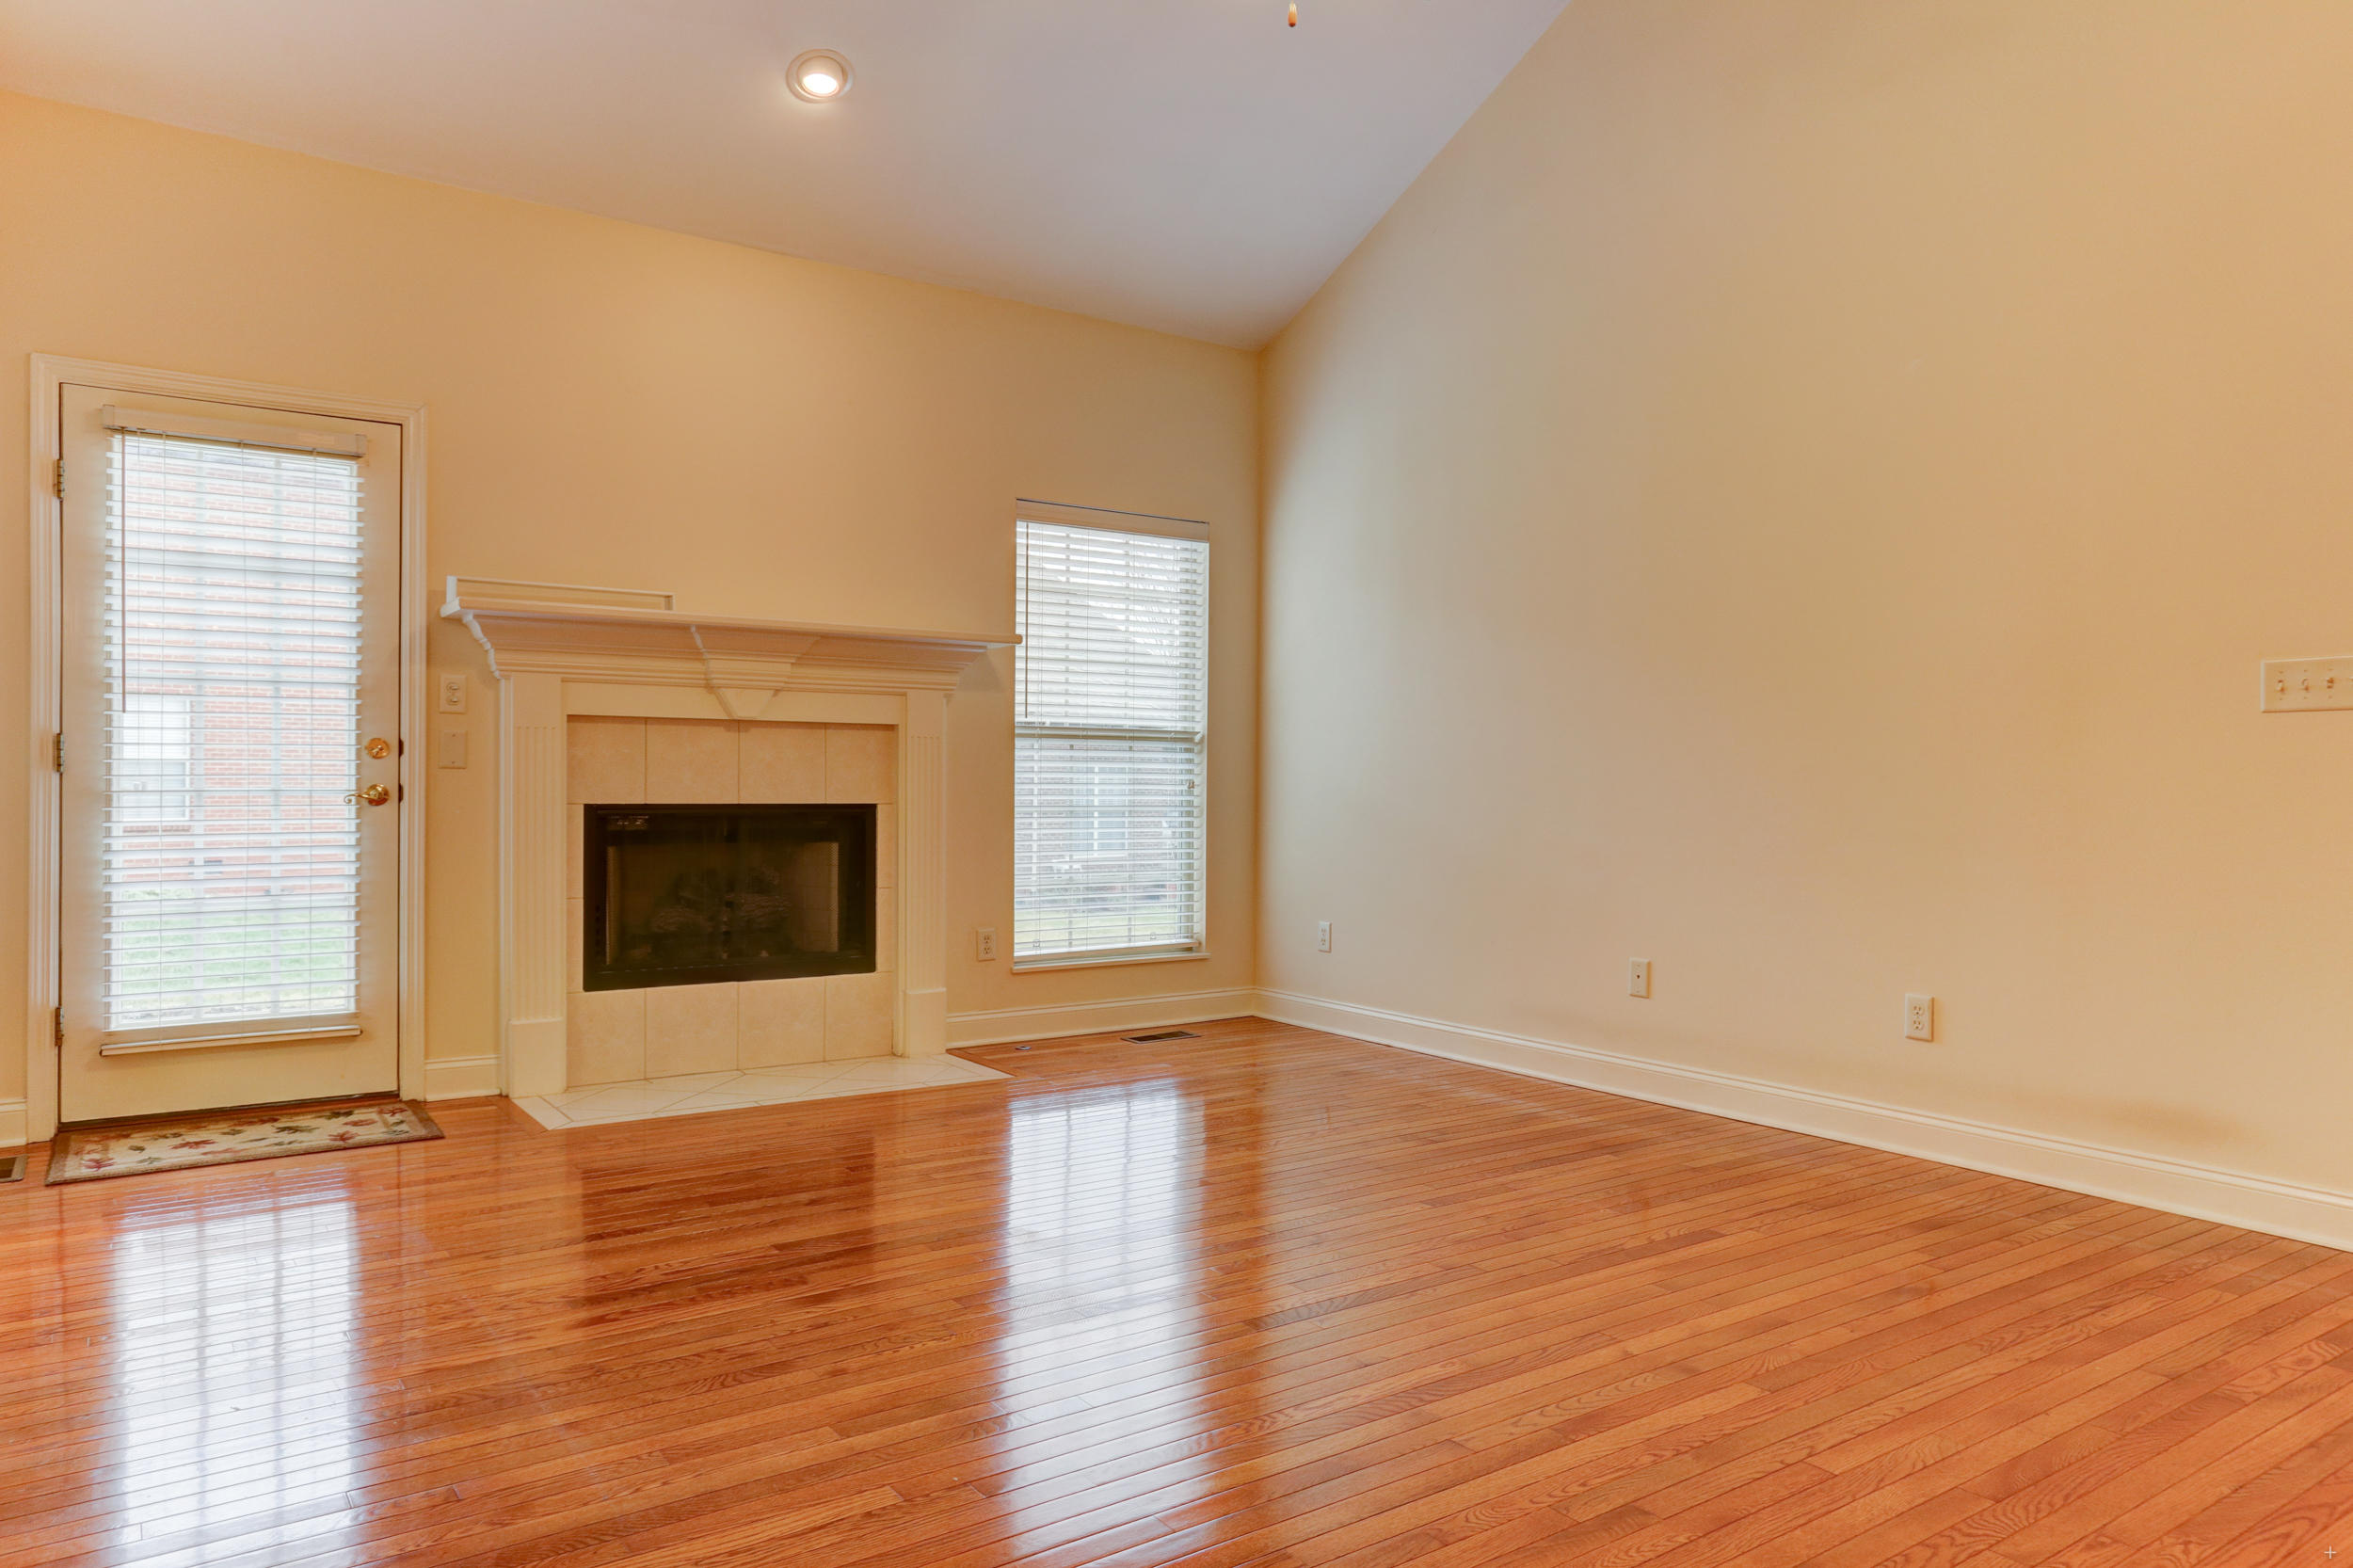 11605 San Martin Lane, Farragut, Tennessee 37934, 4 Bedrooms Bedrooms, ,3 BathroomsBathrooms,Single Family,For Sale,San Martin,1067773